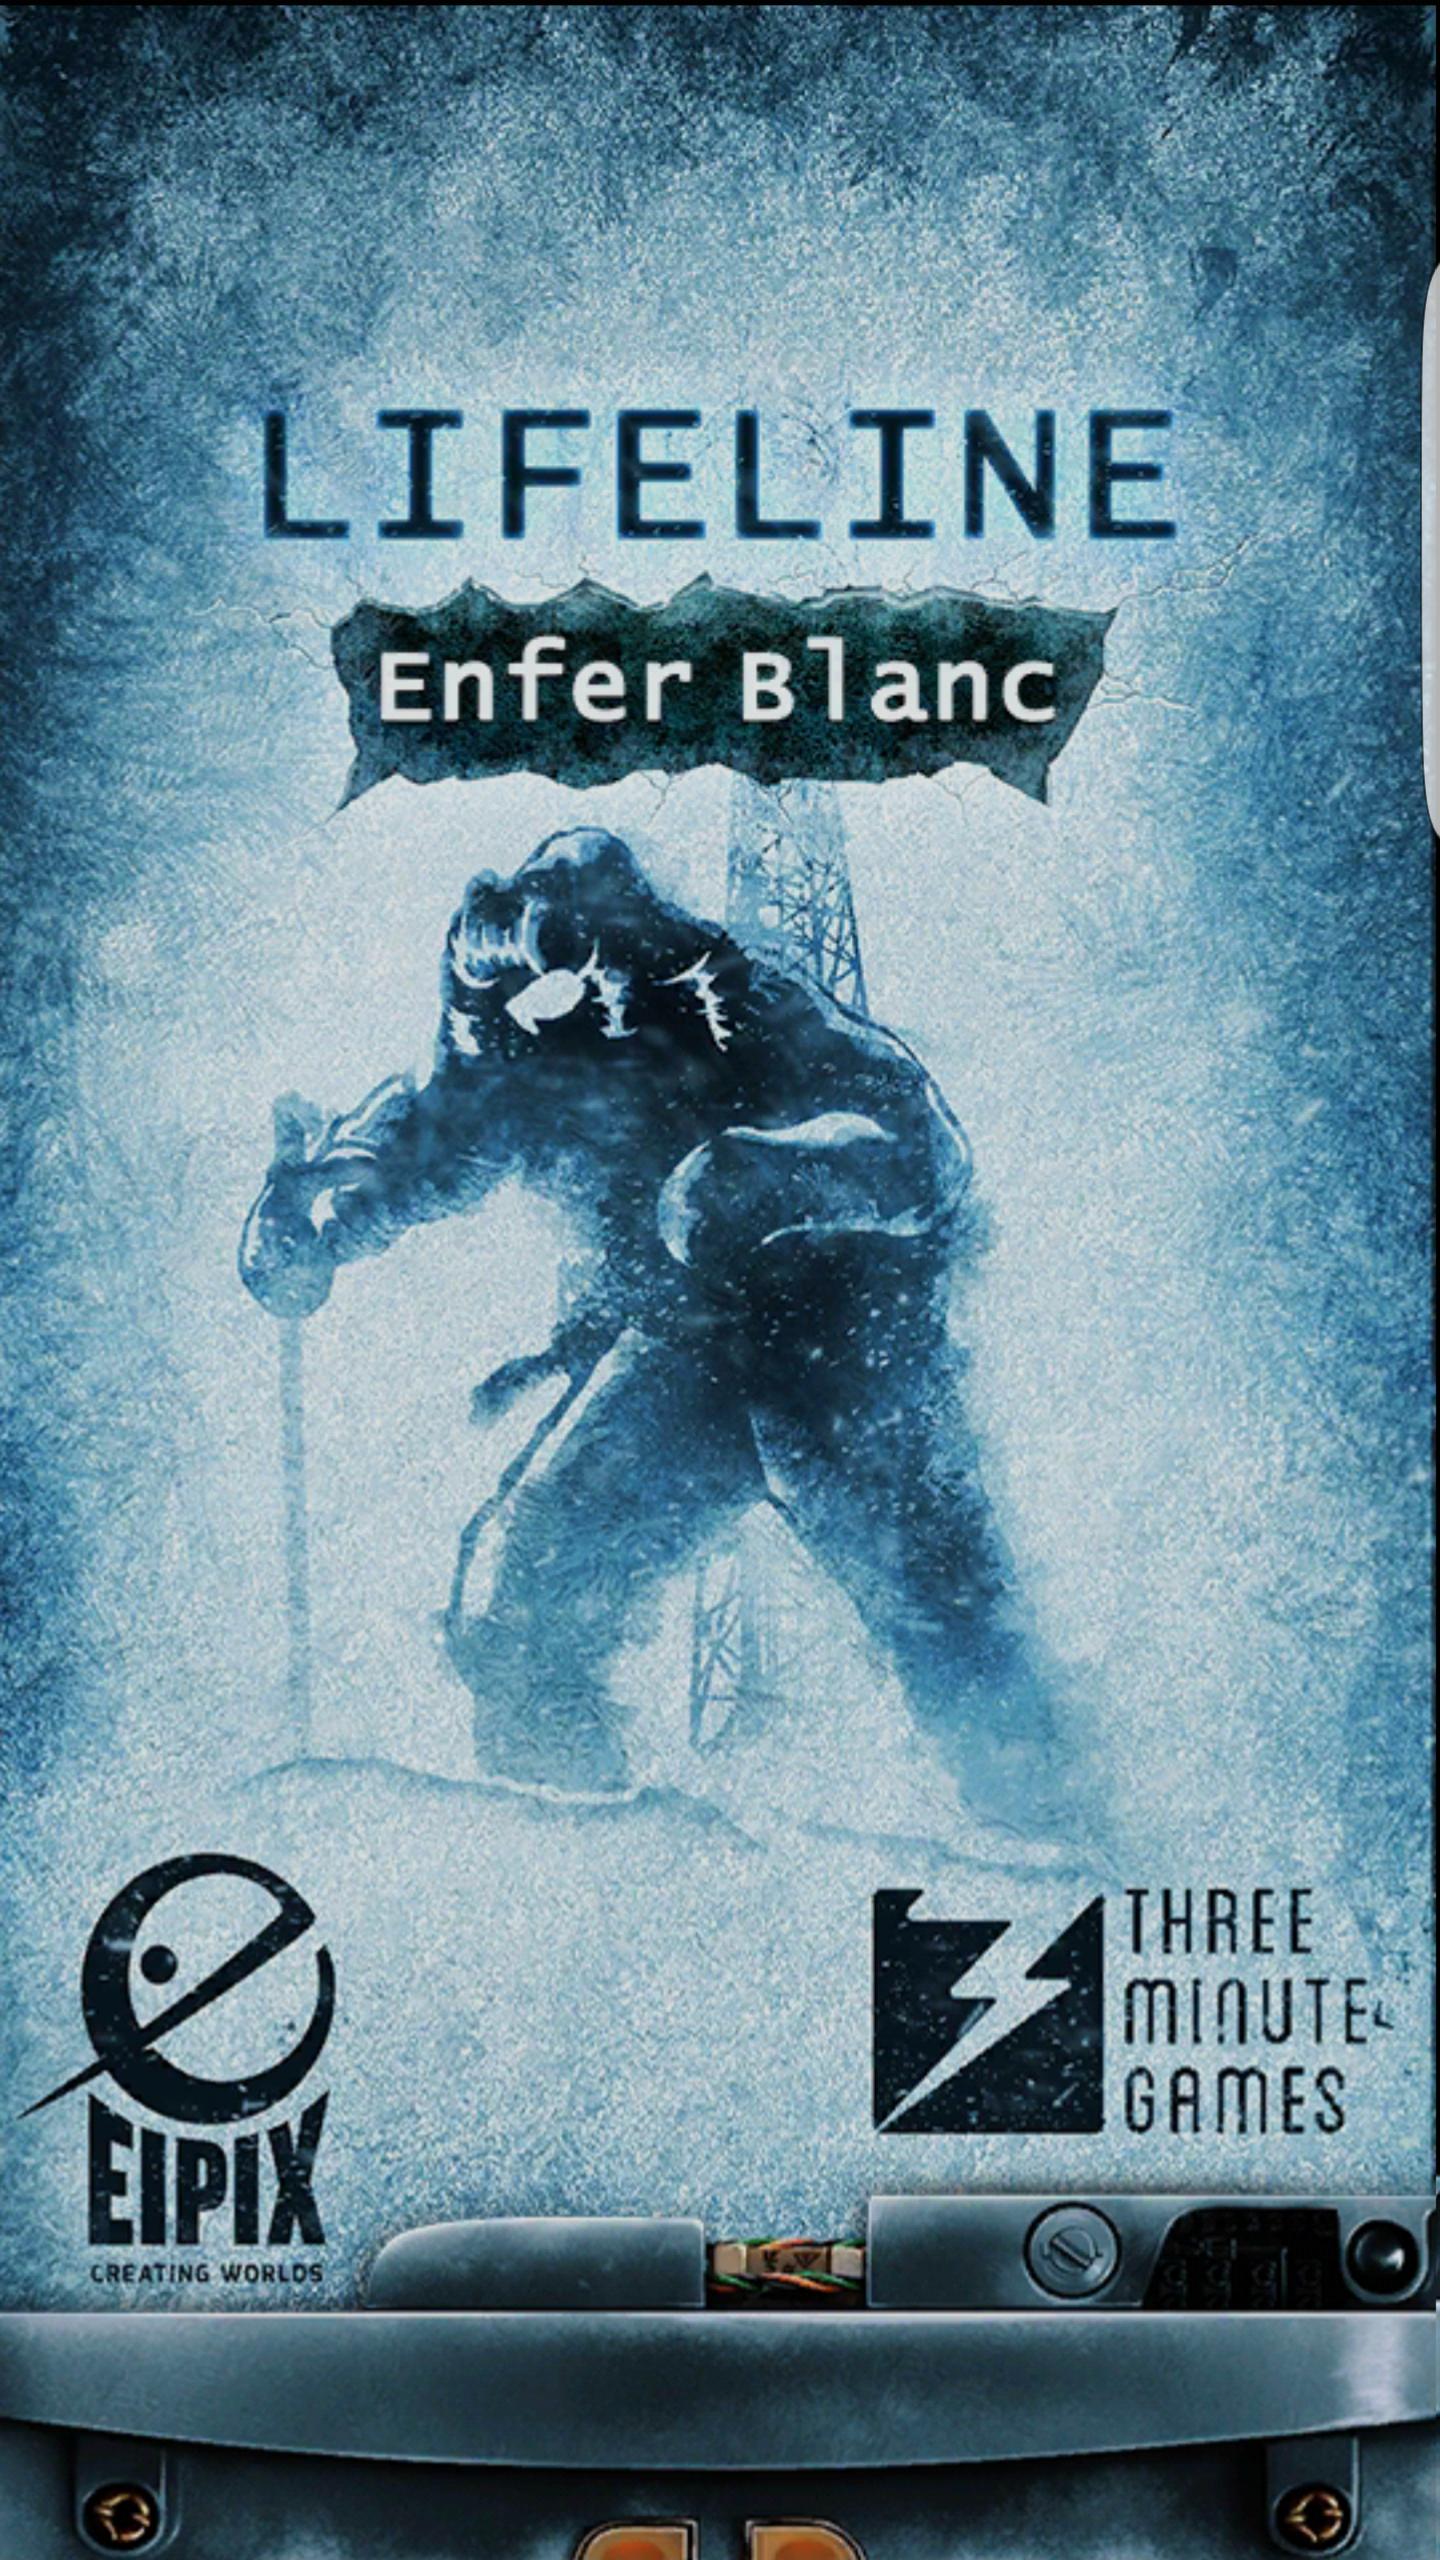 Lifeline Enfer Blanc-1